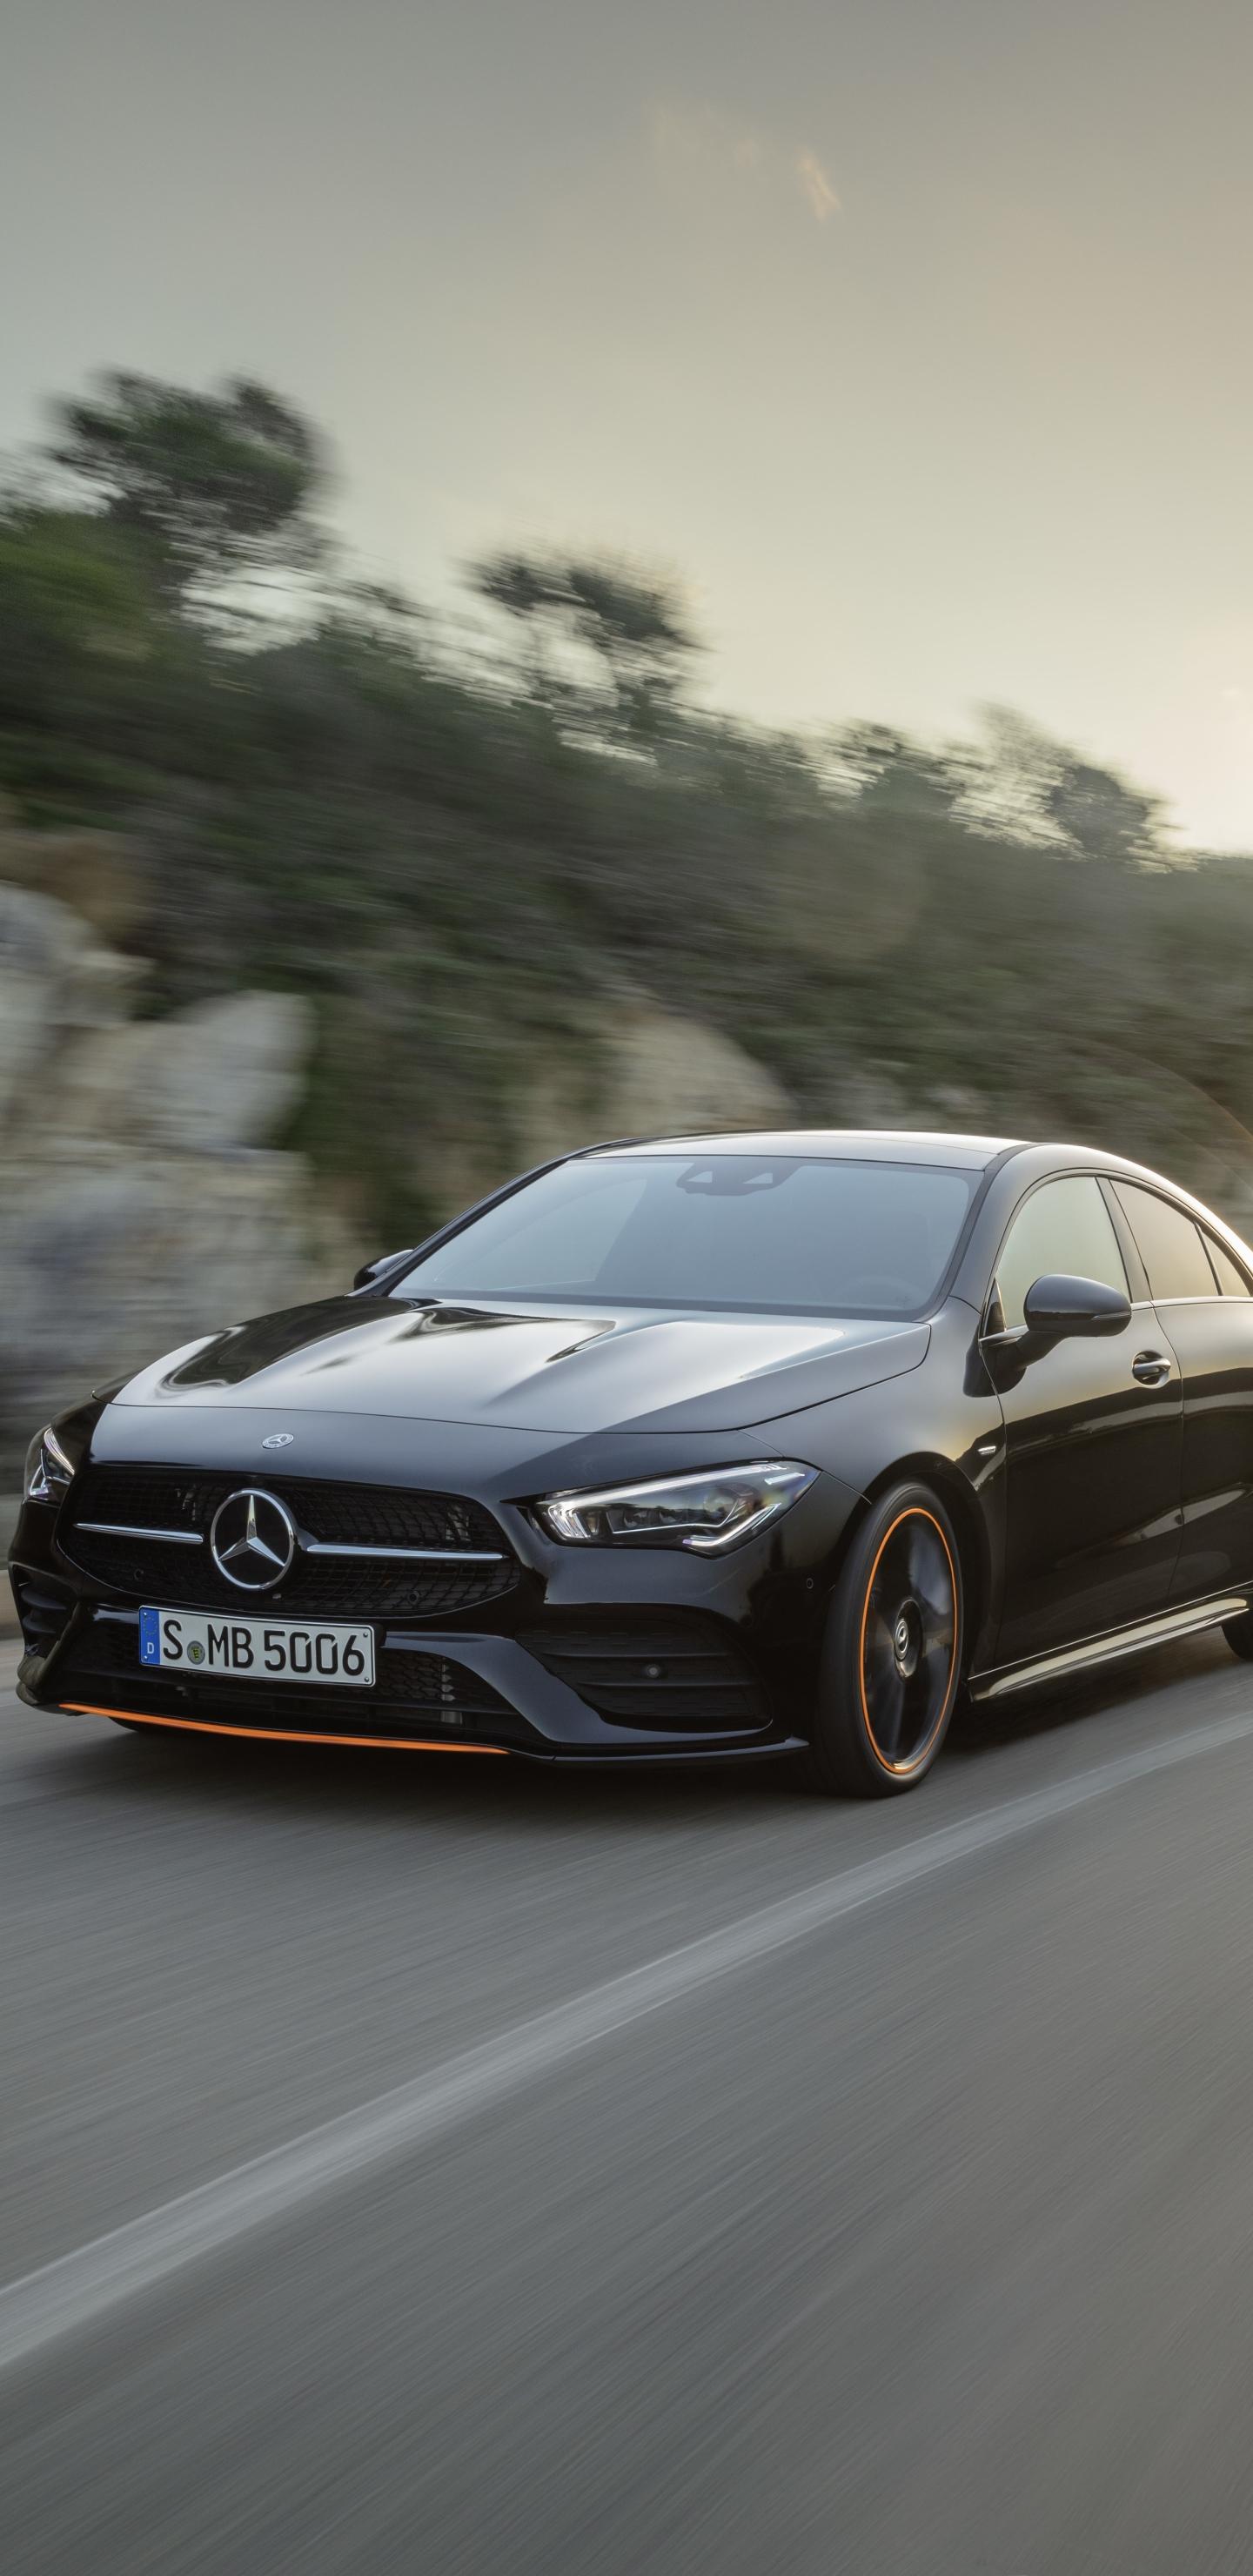 57+ Mercedes Benz CLA Wallpapers on WallpaperSafari